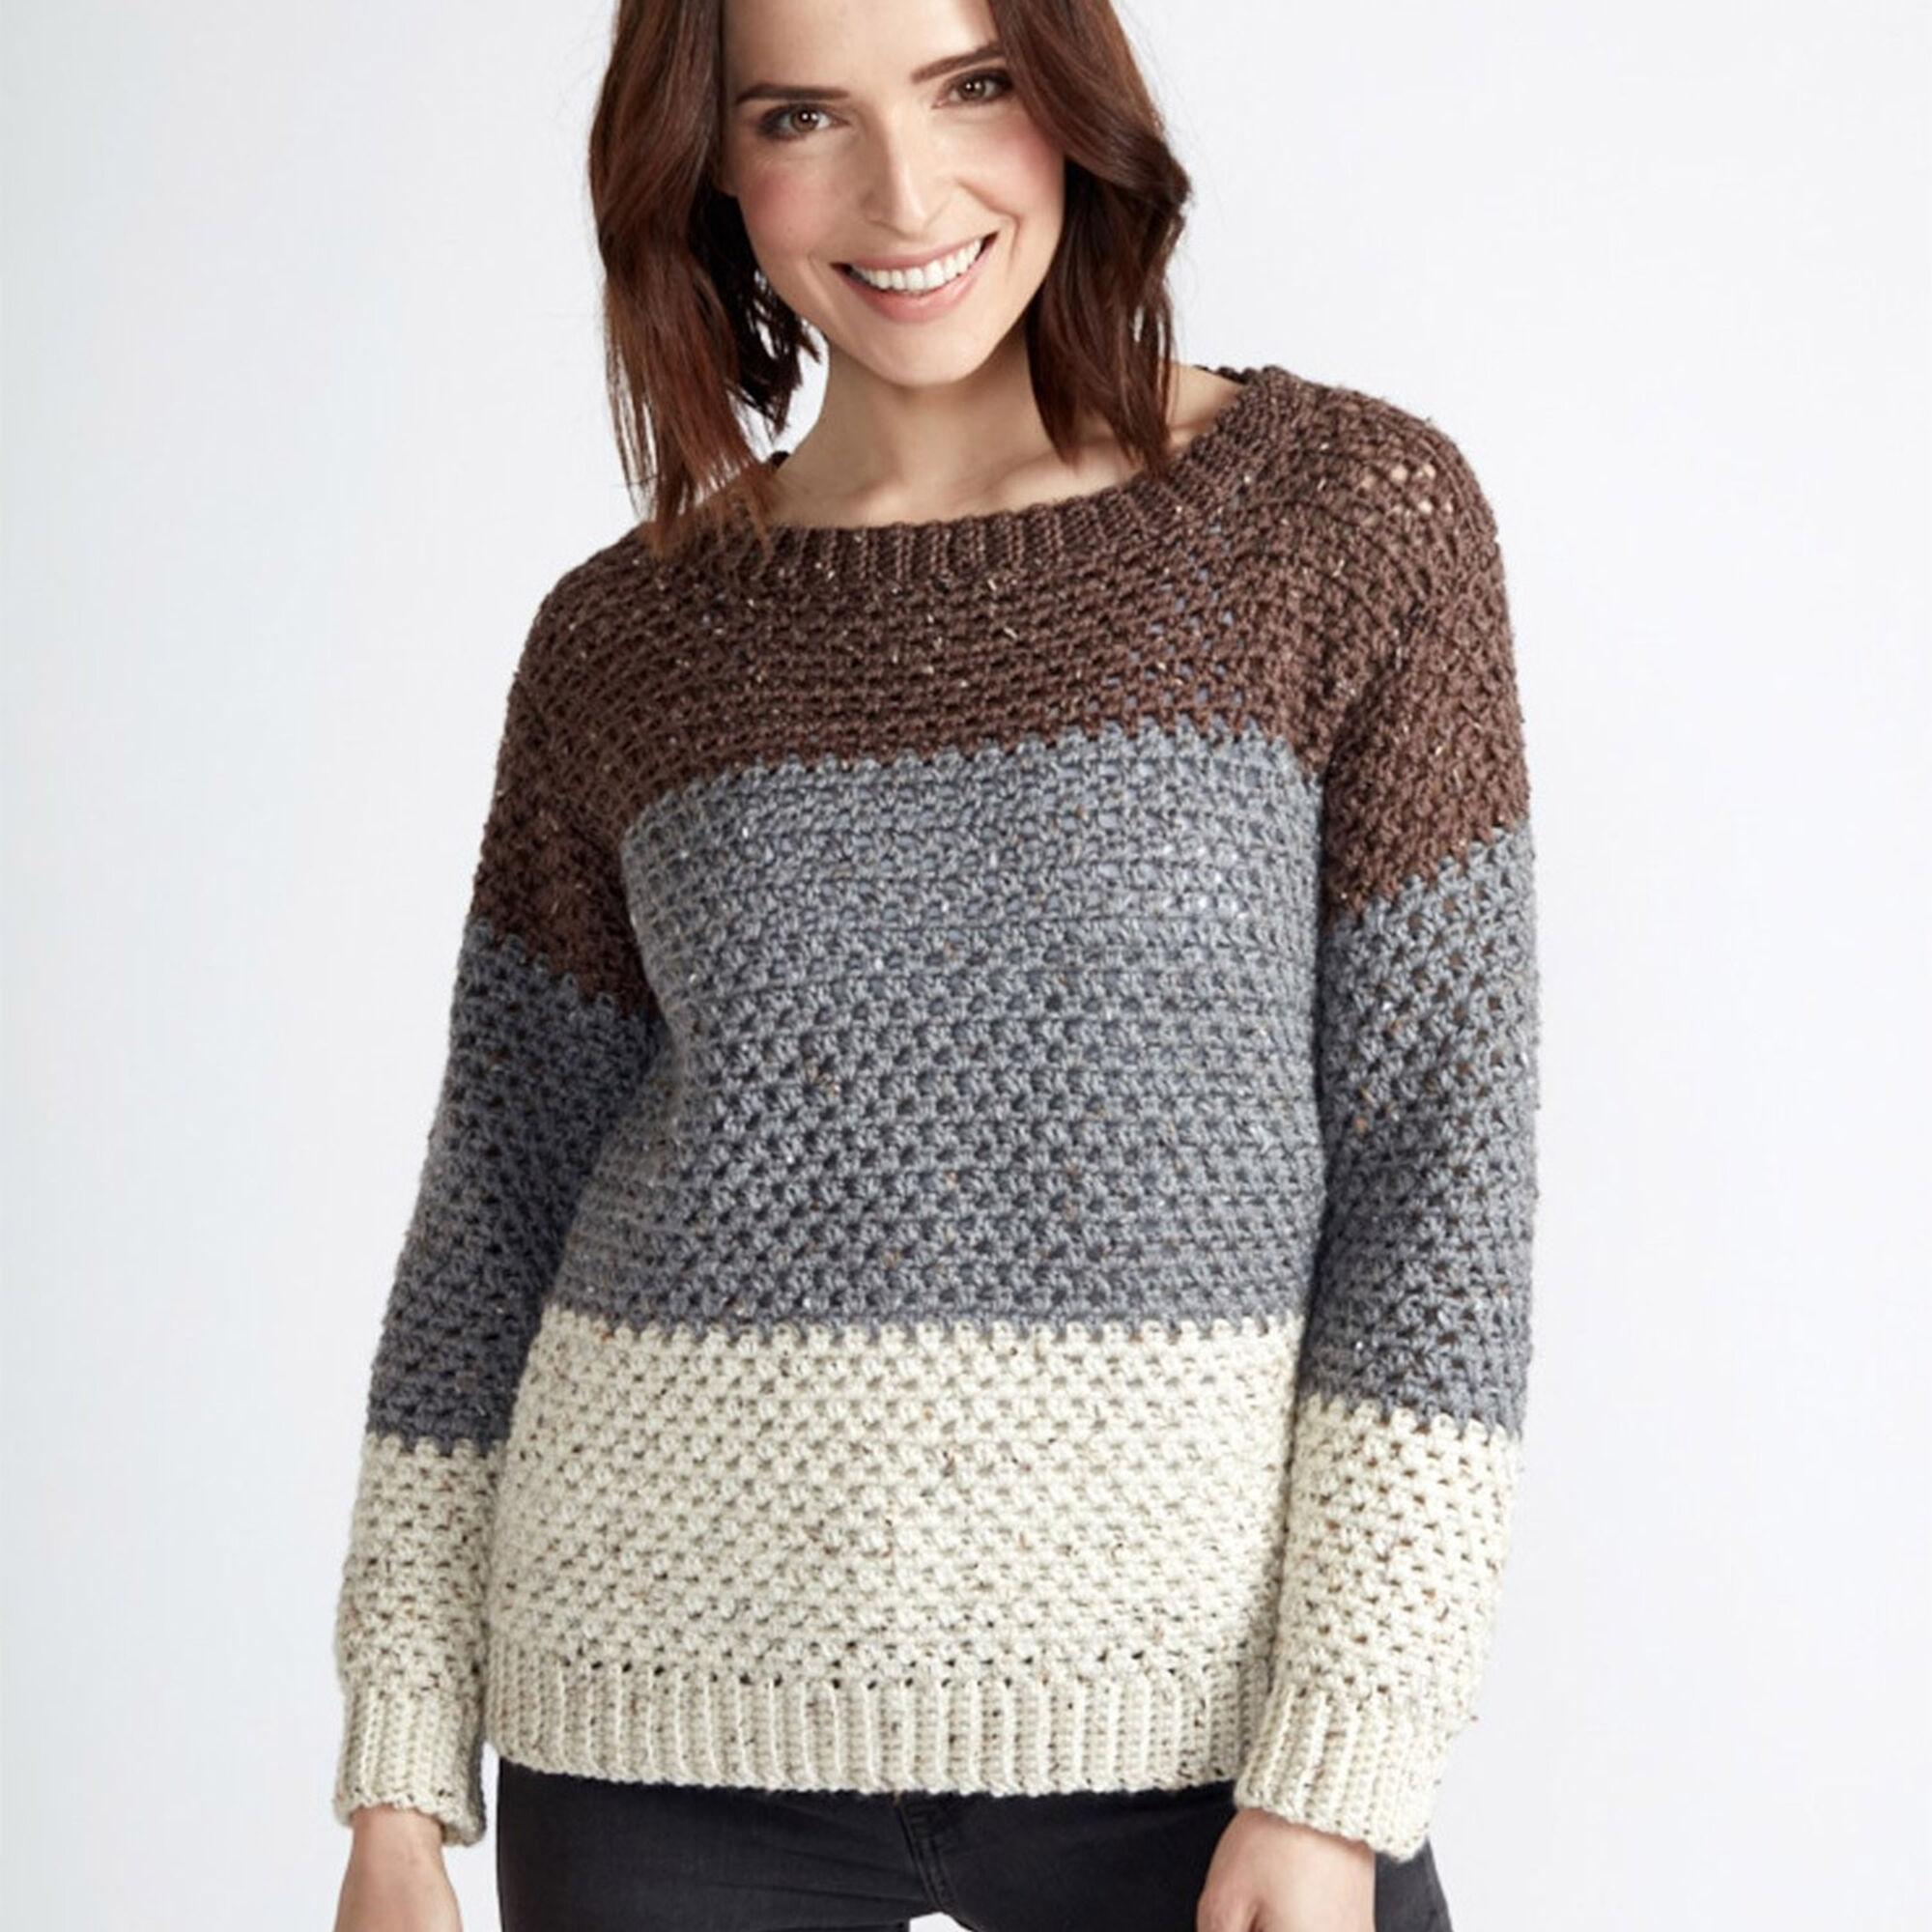 Caron Stepping Stones Crochet Pullover, XS/S | Yarnspirations